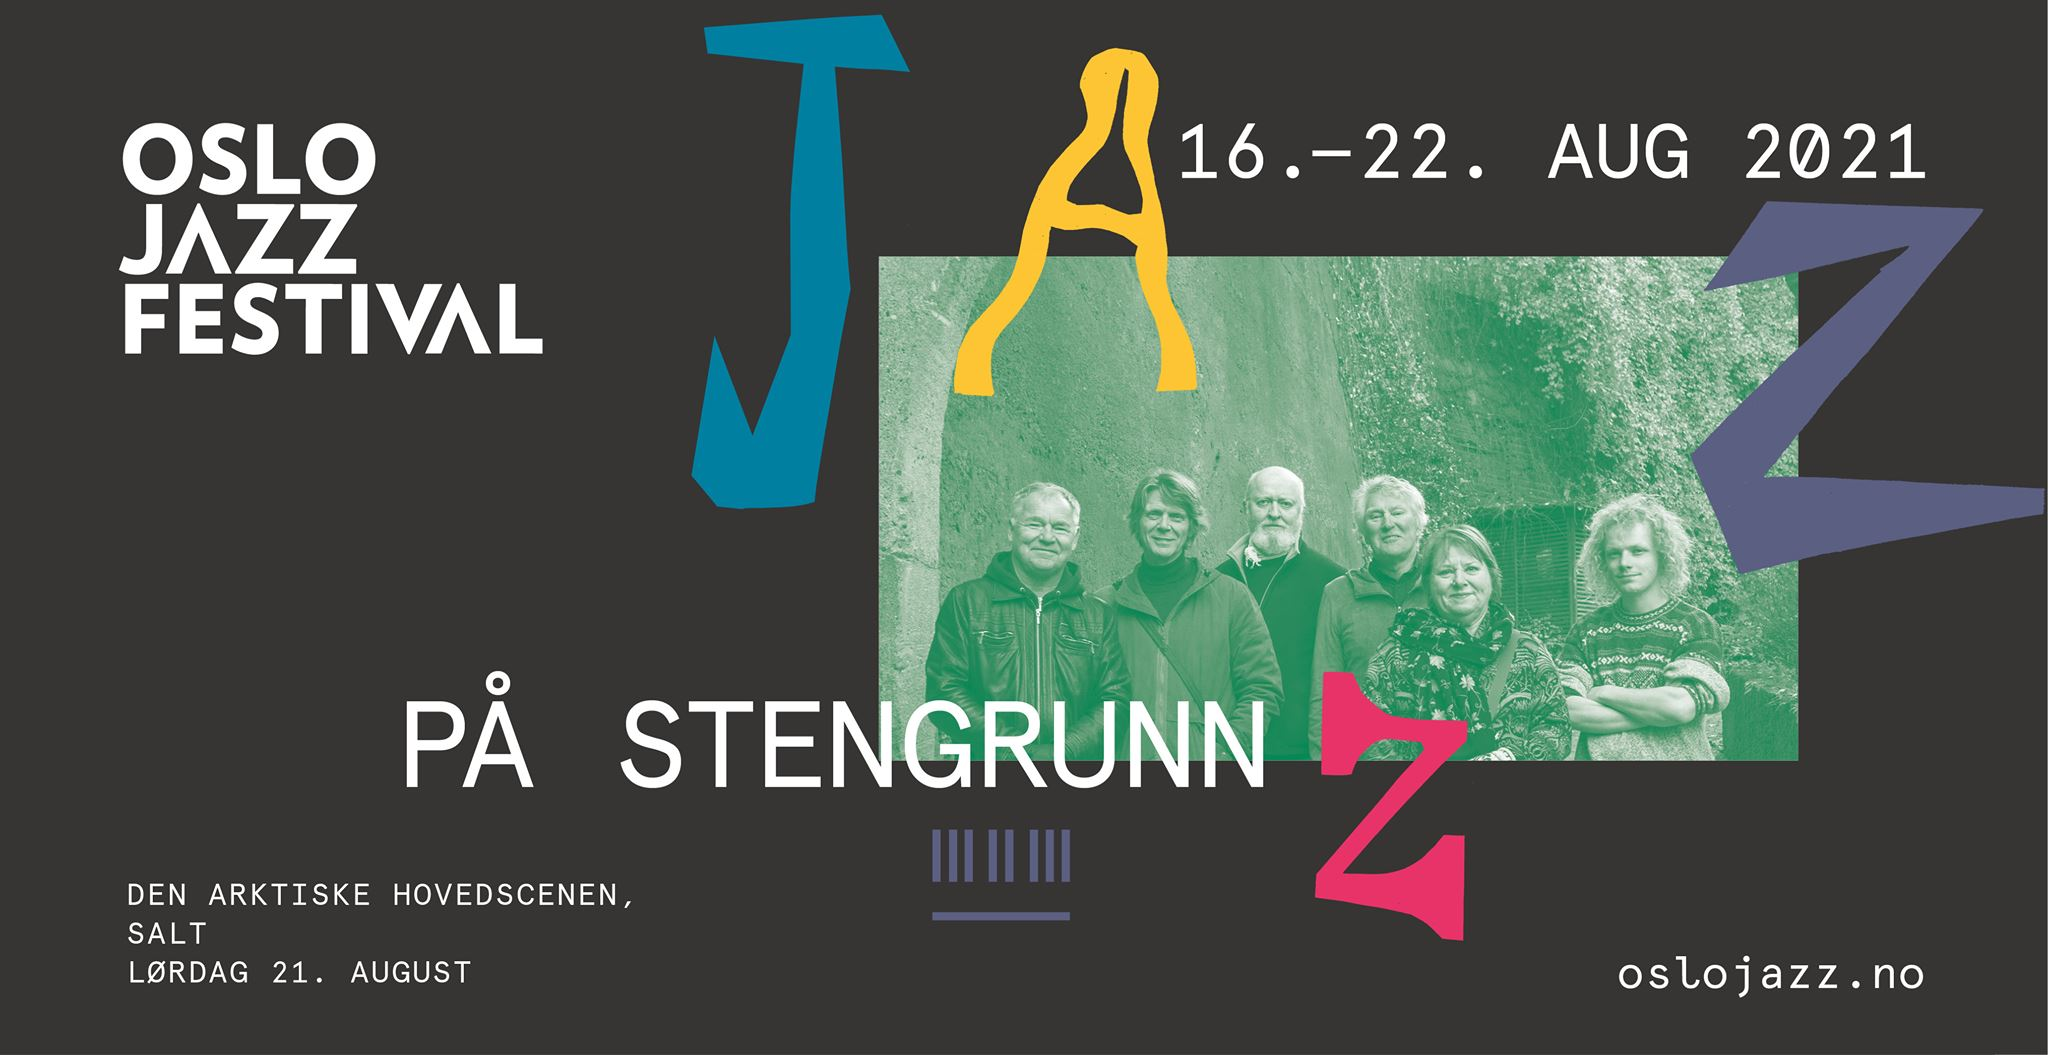 På Stengrunn på Oslo Jazzfestival